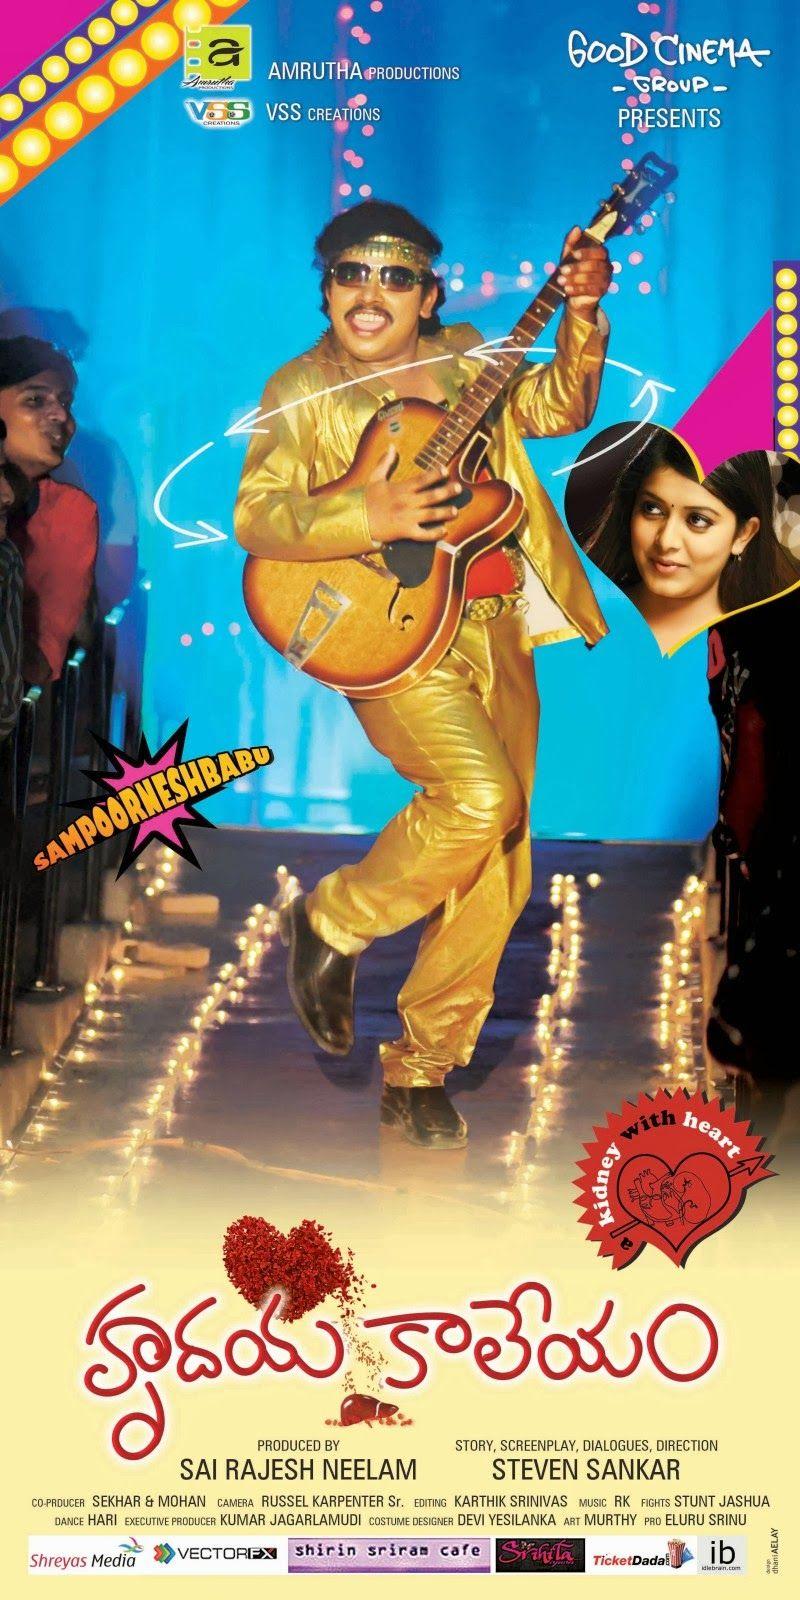 Hrudaya kaleyam movie review by critics hyderabad voice entertainment news telugu cinema news